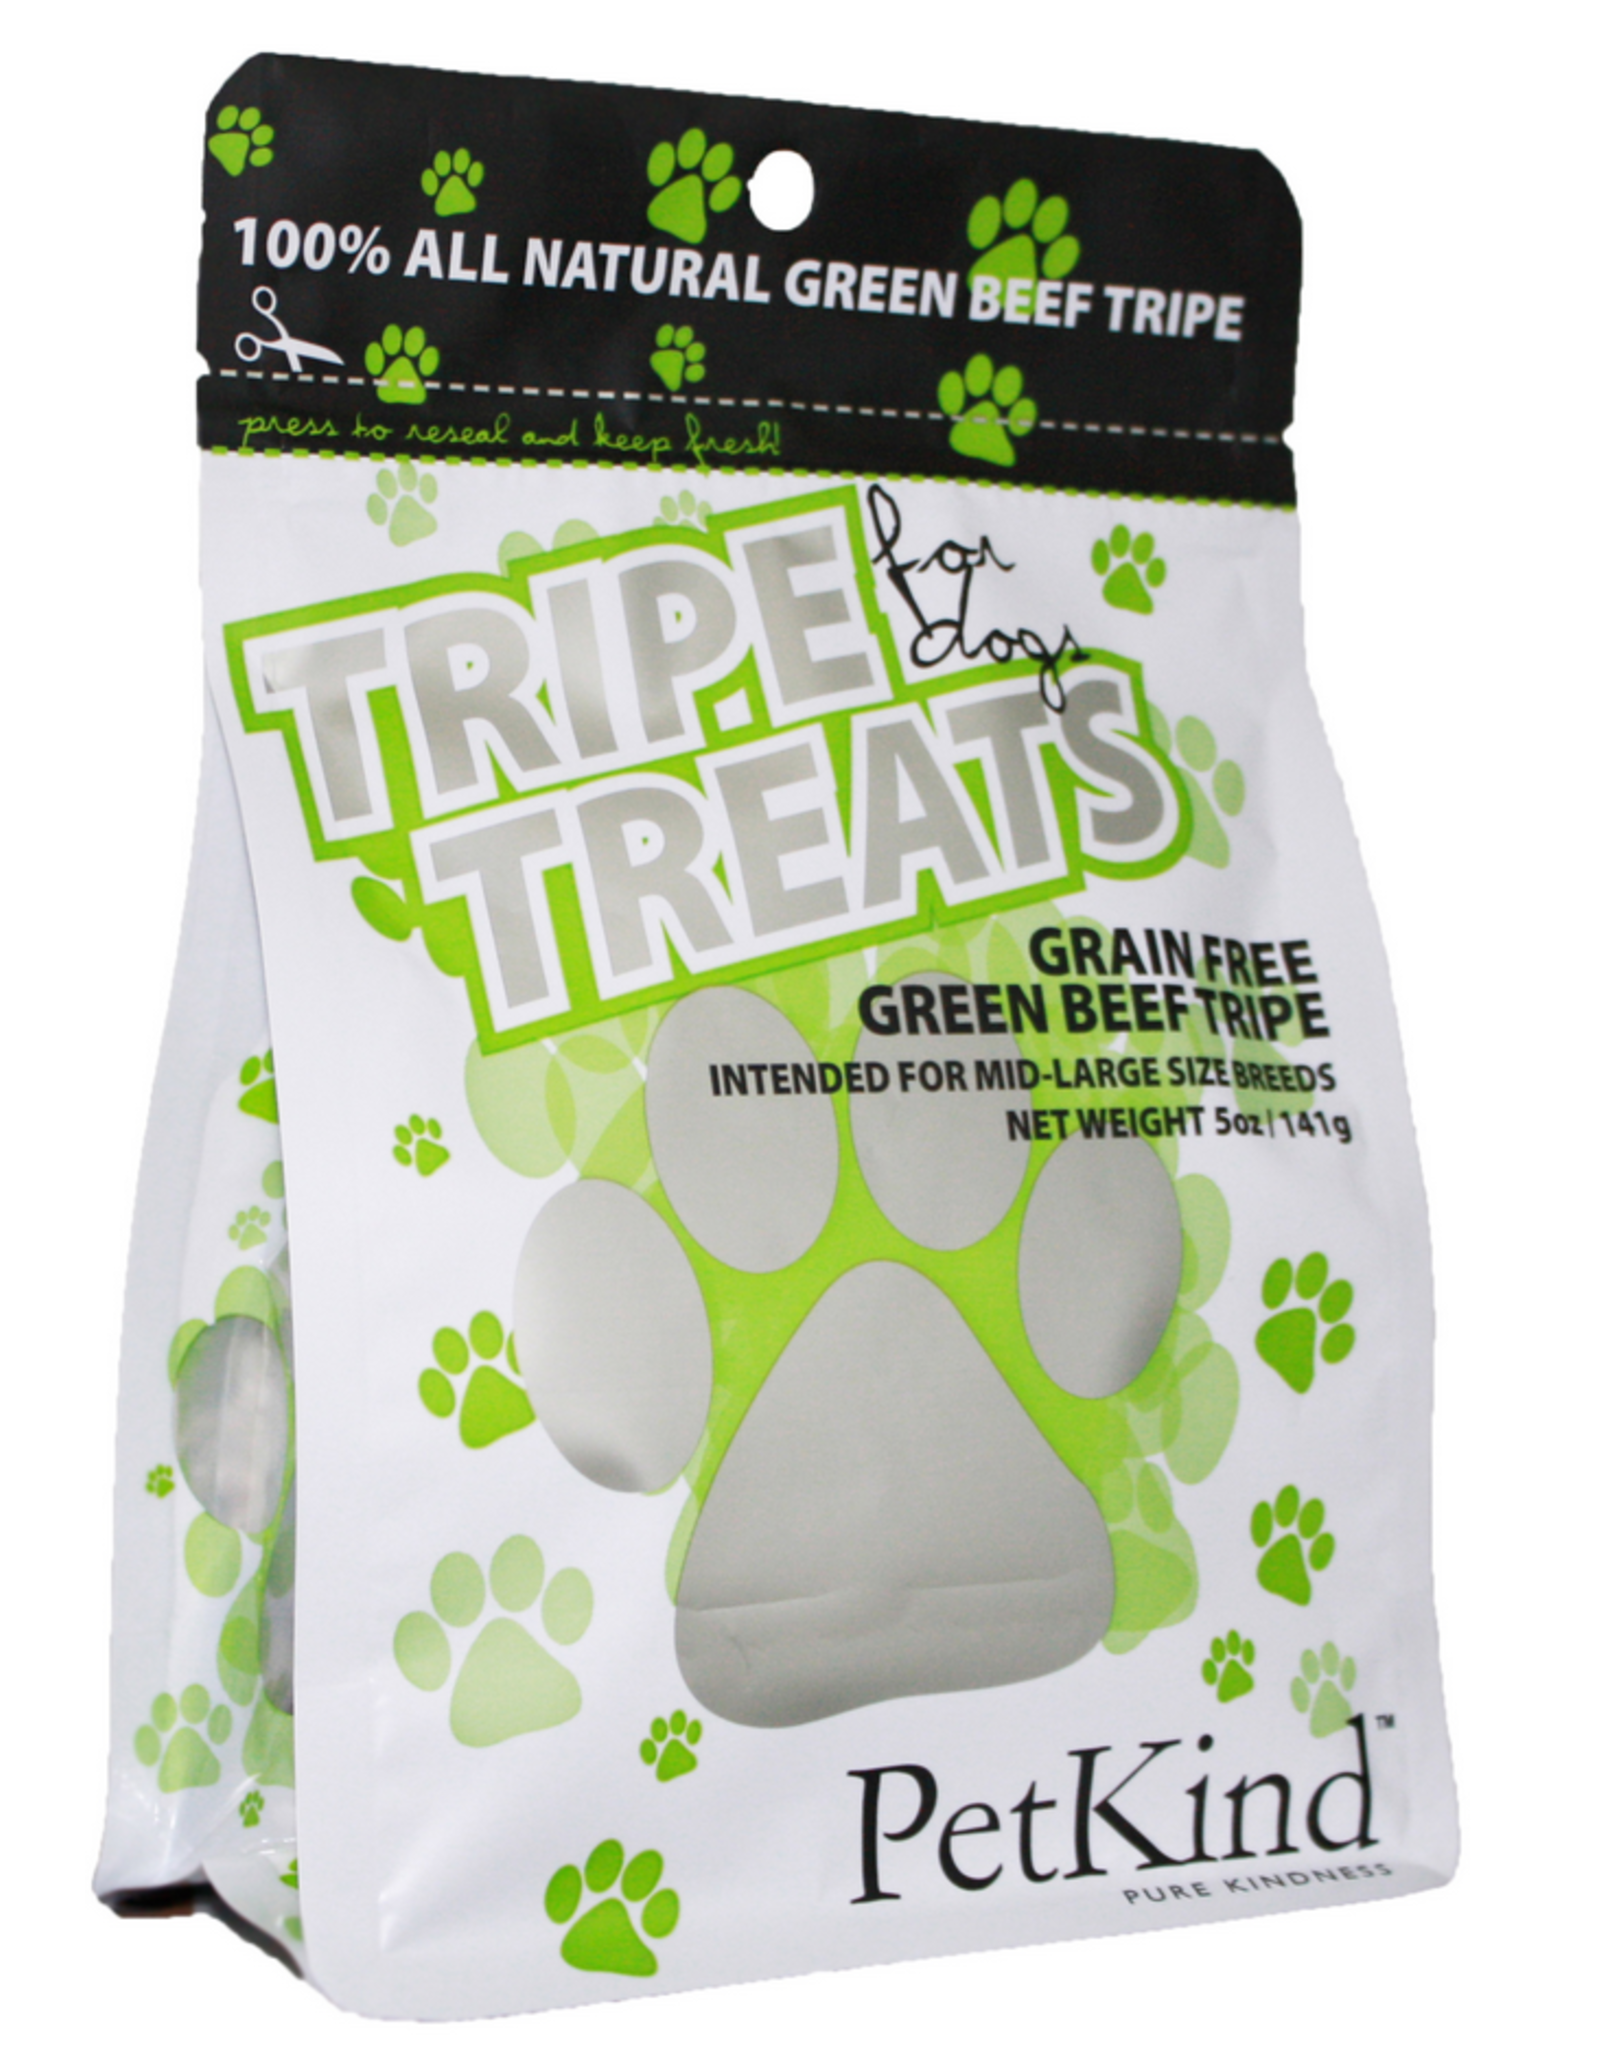 PetKind Petkind - Tripe Treat - Pure Green Beef Tripe - 5oz